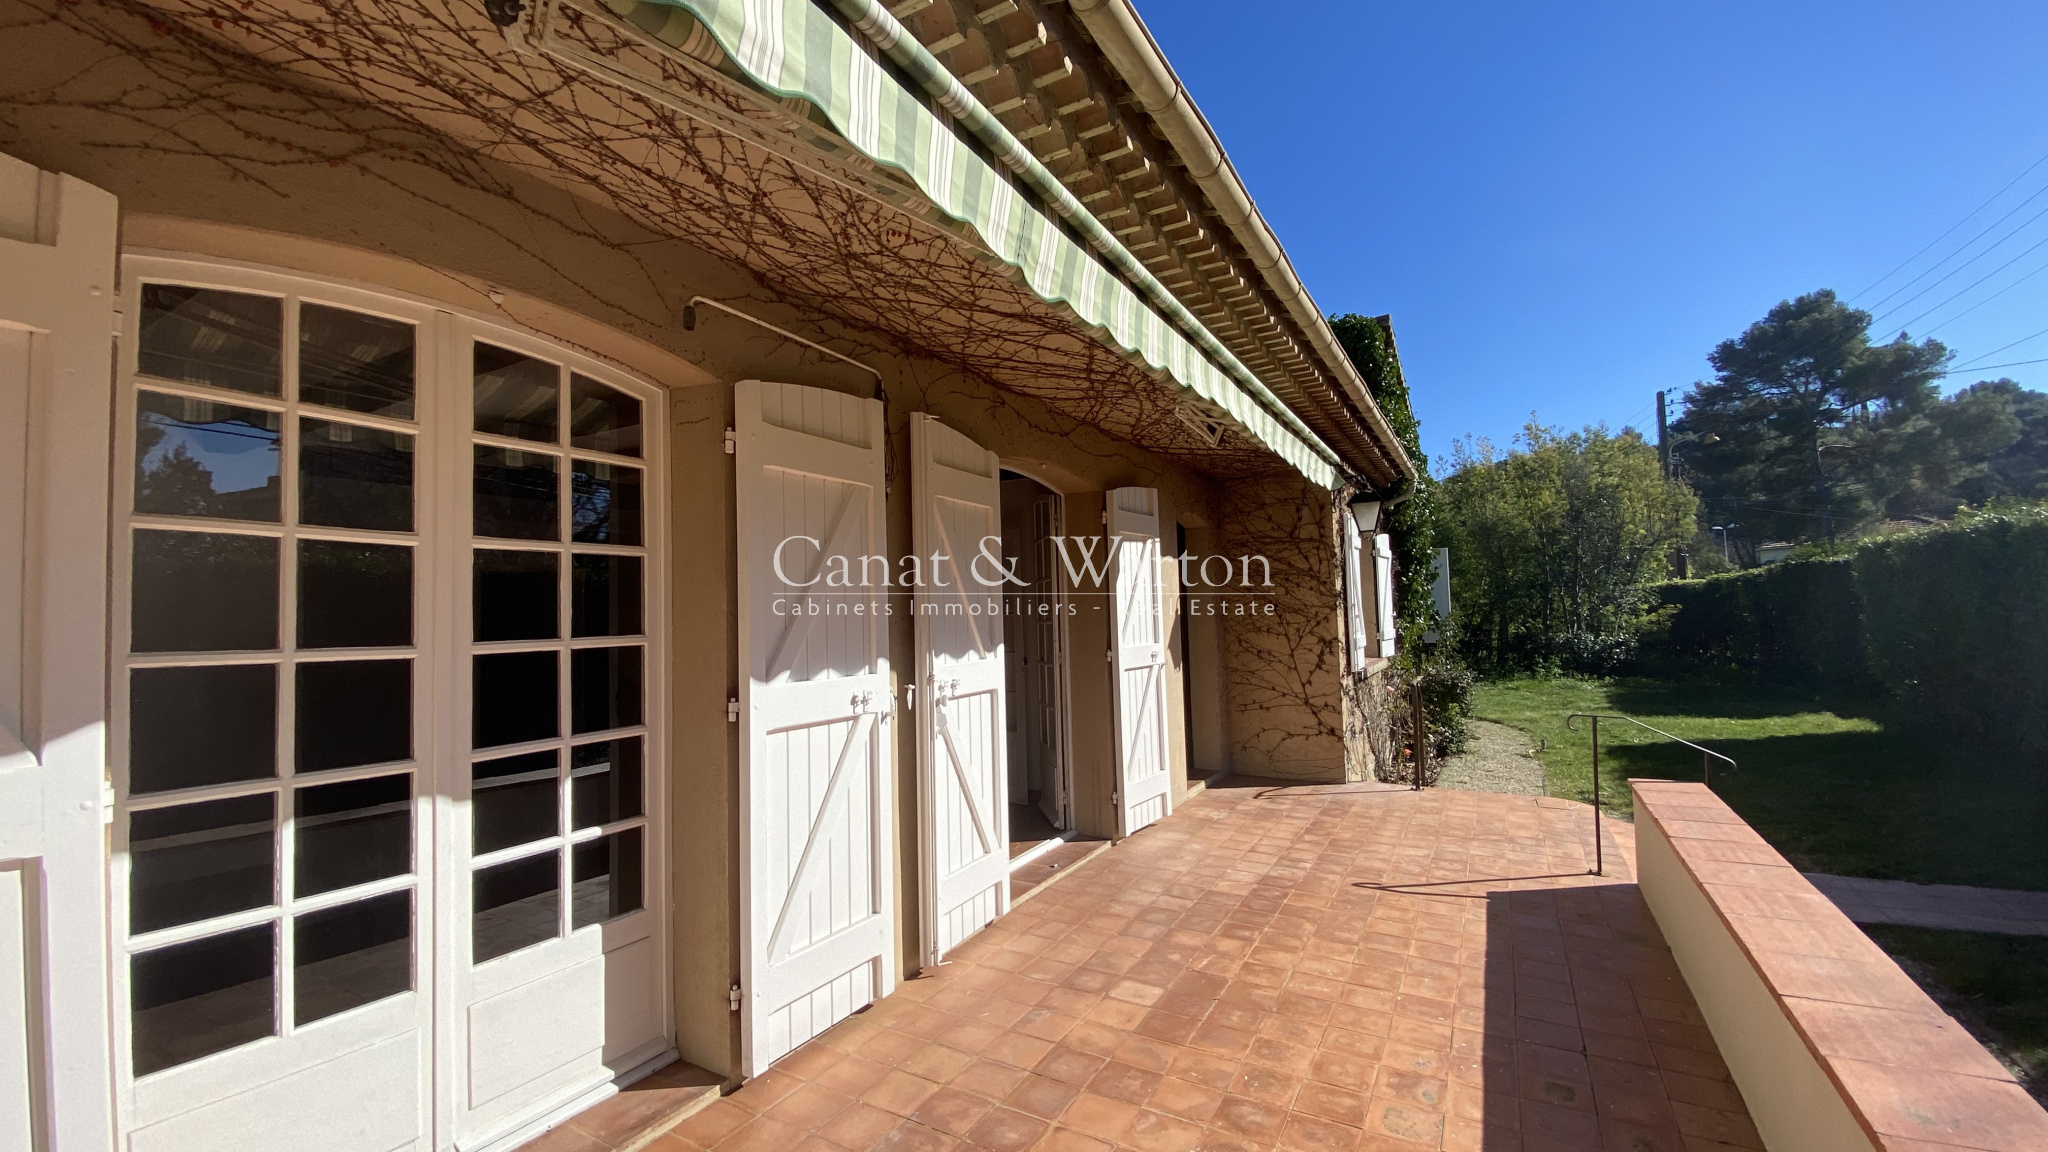 Vente VILLA CAP BRUN PROCHE MER Toulon - maison / villa à vendre Toulon